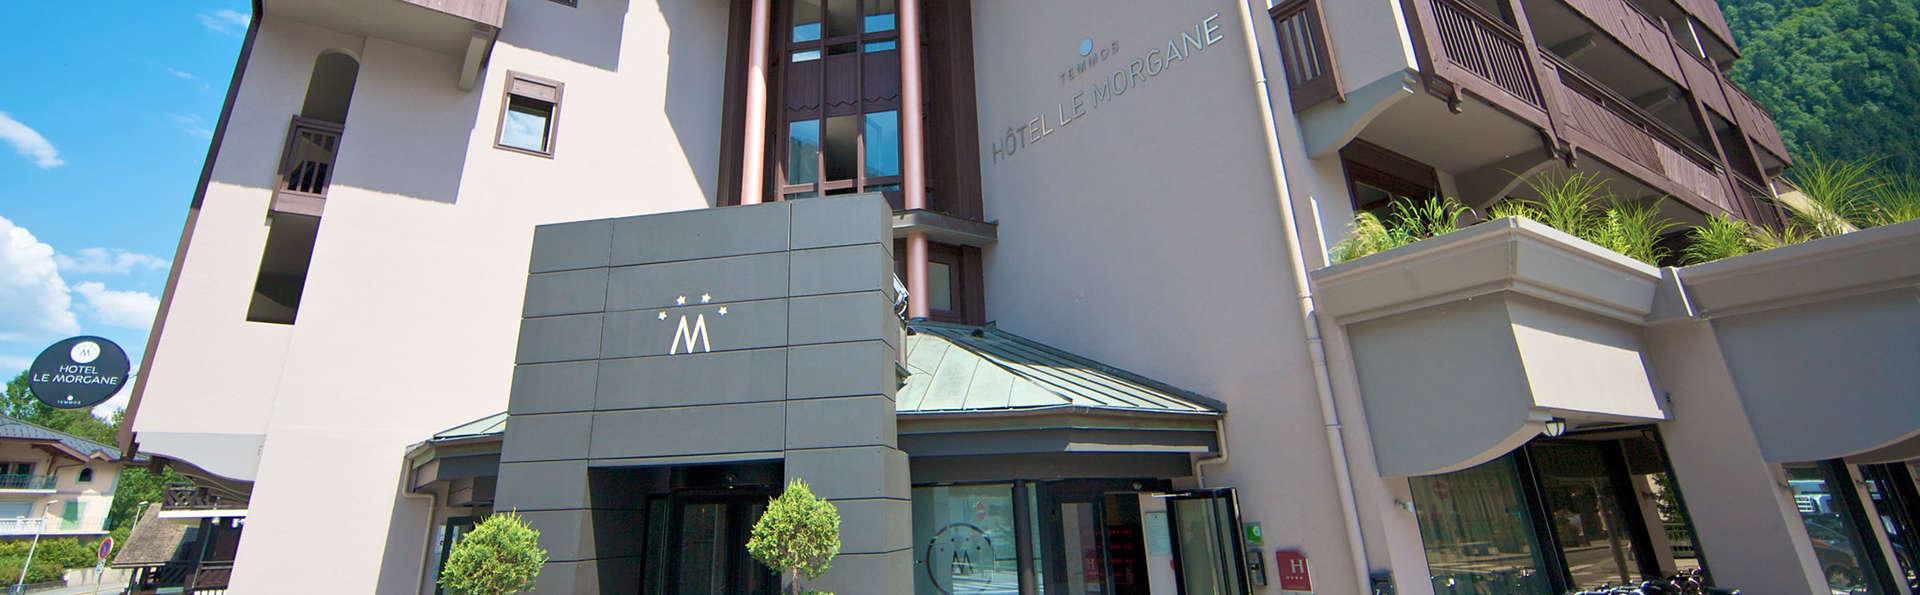 Hôtel Le Morgane - EDIT_FRONT.jpg